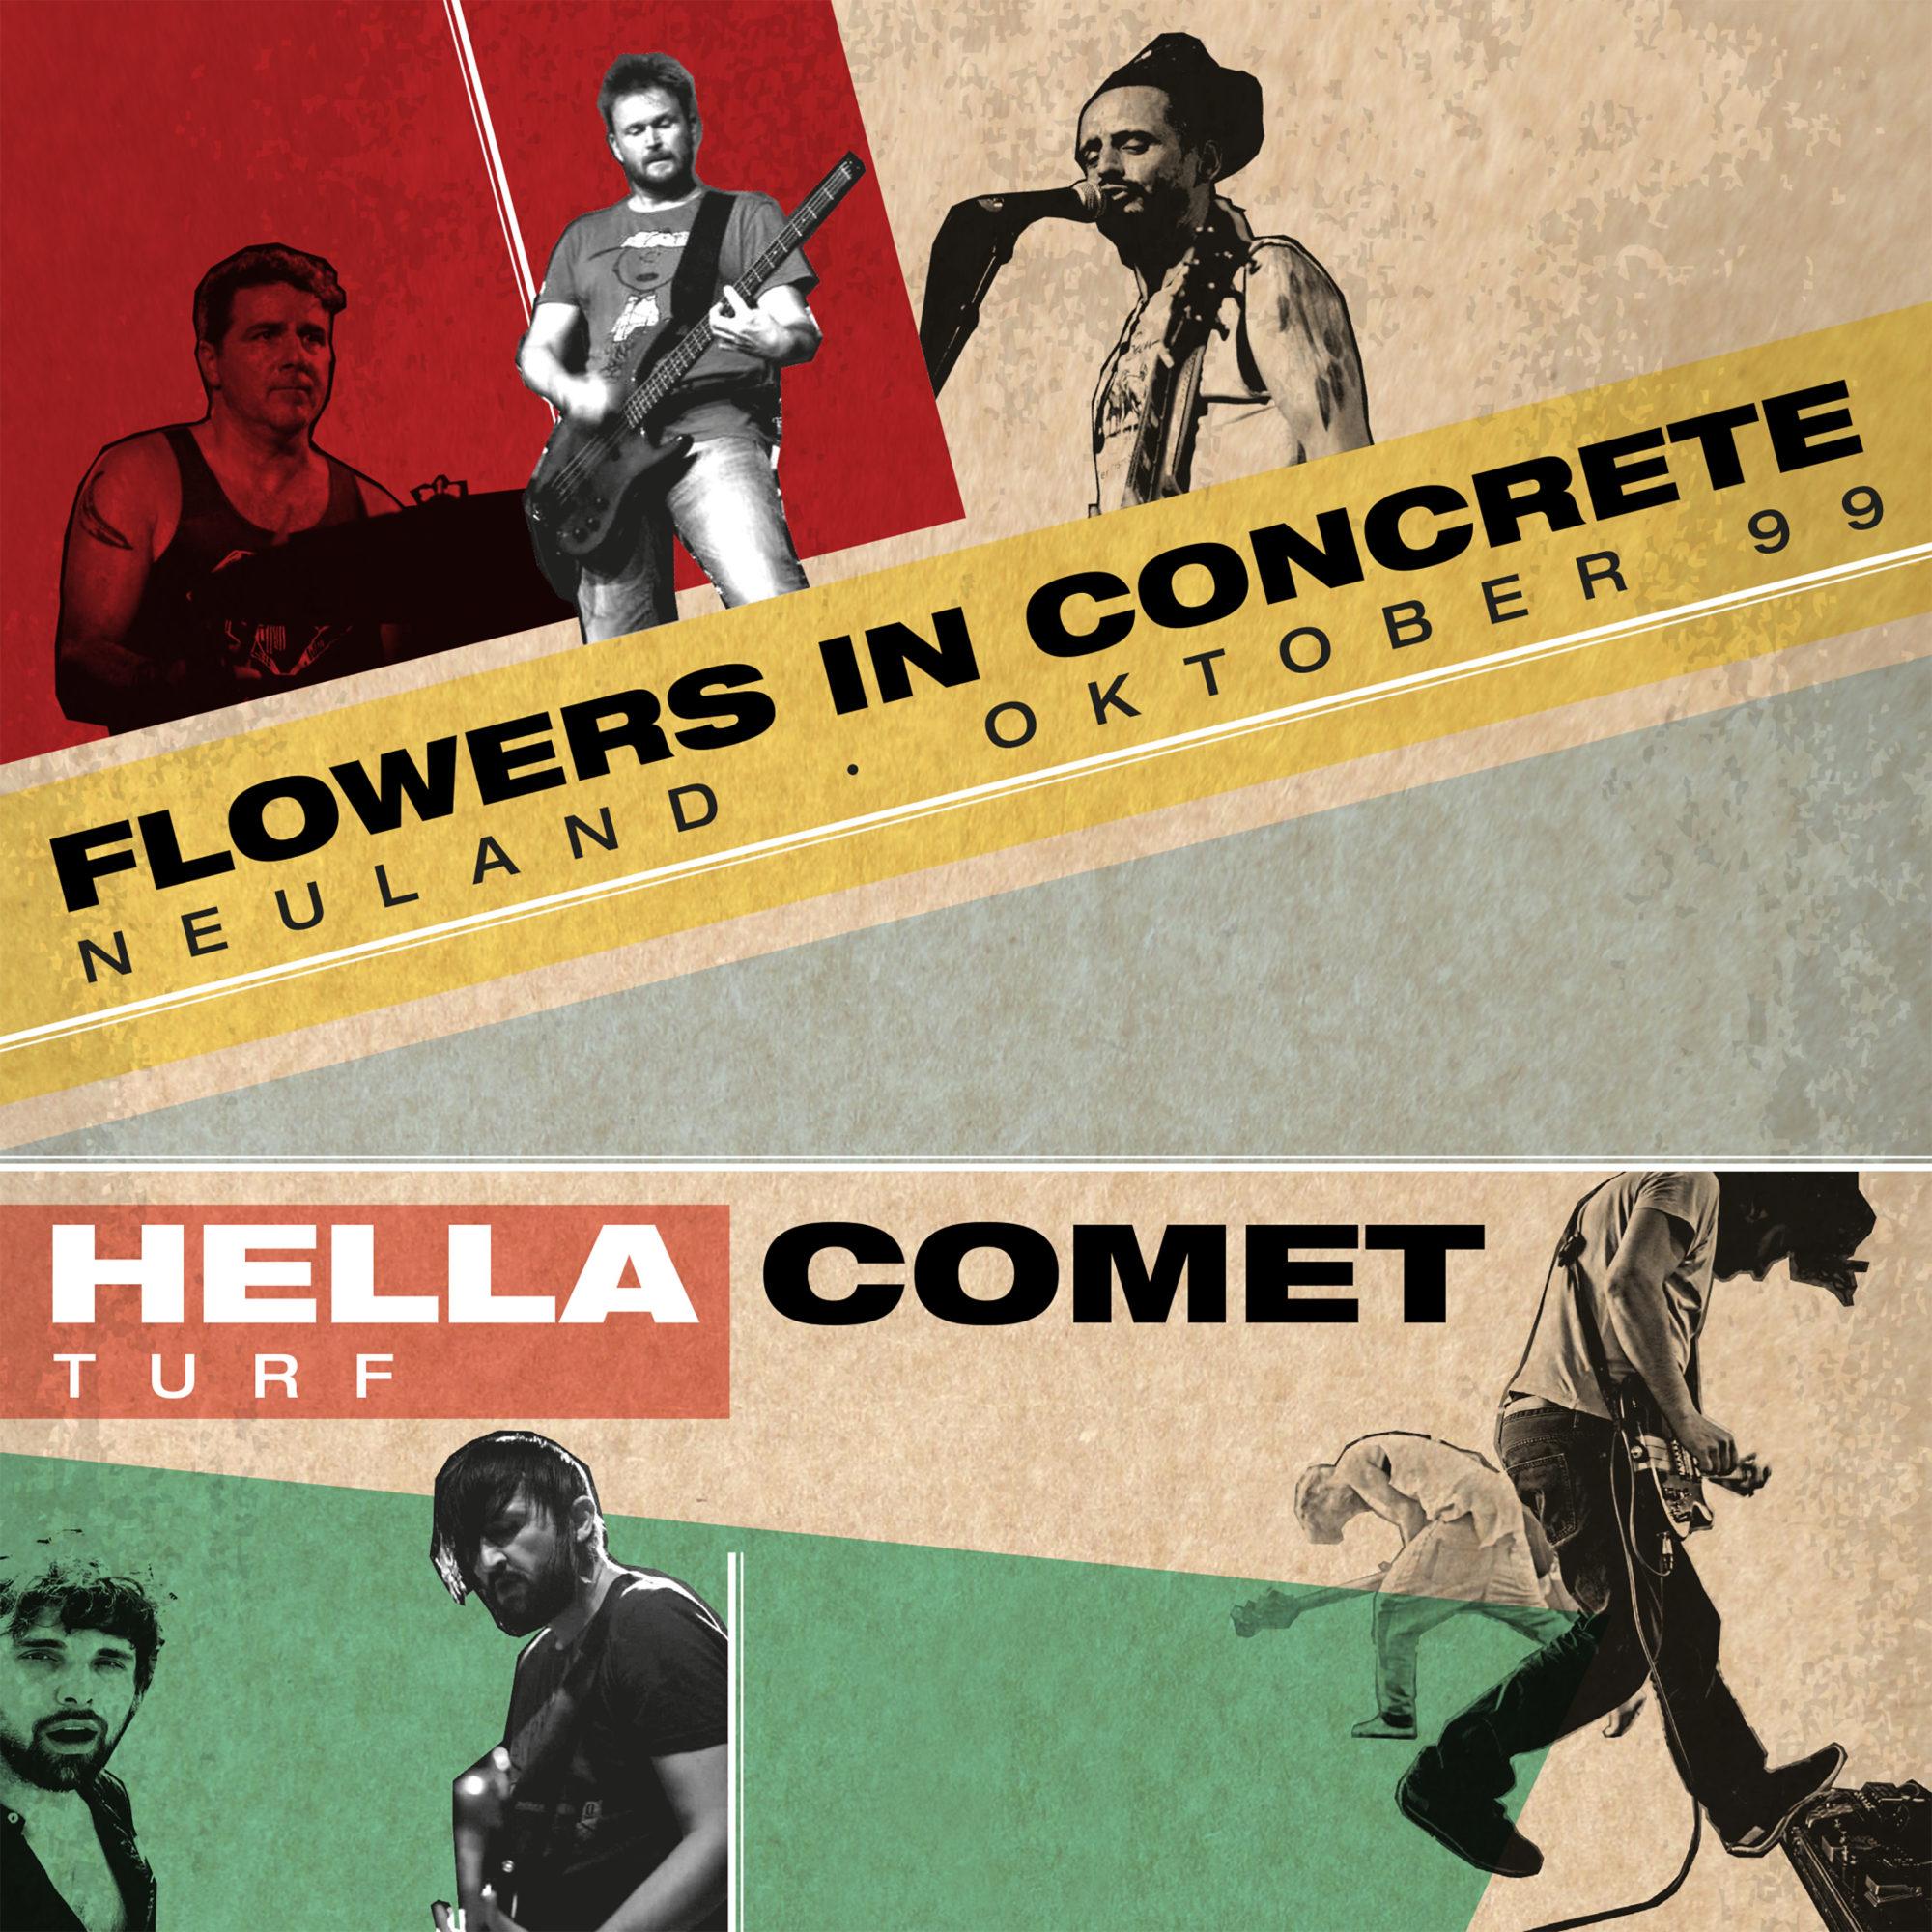 Flowers in Concrete Band Hella Comet Band Artwork Split Vinyl Single Austria